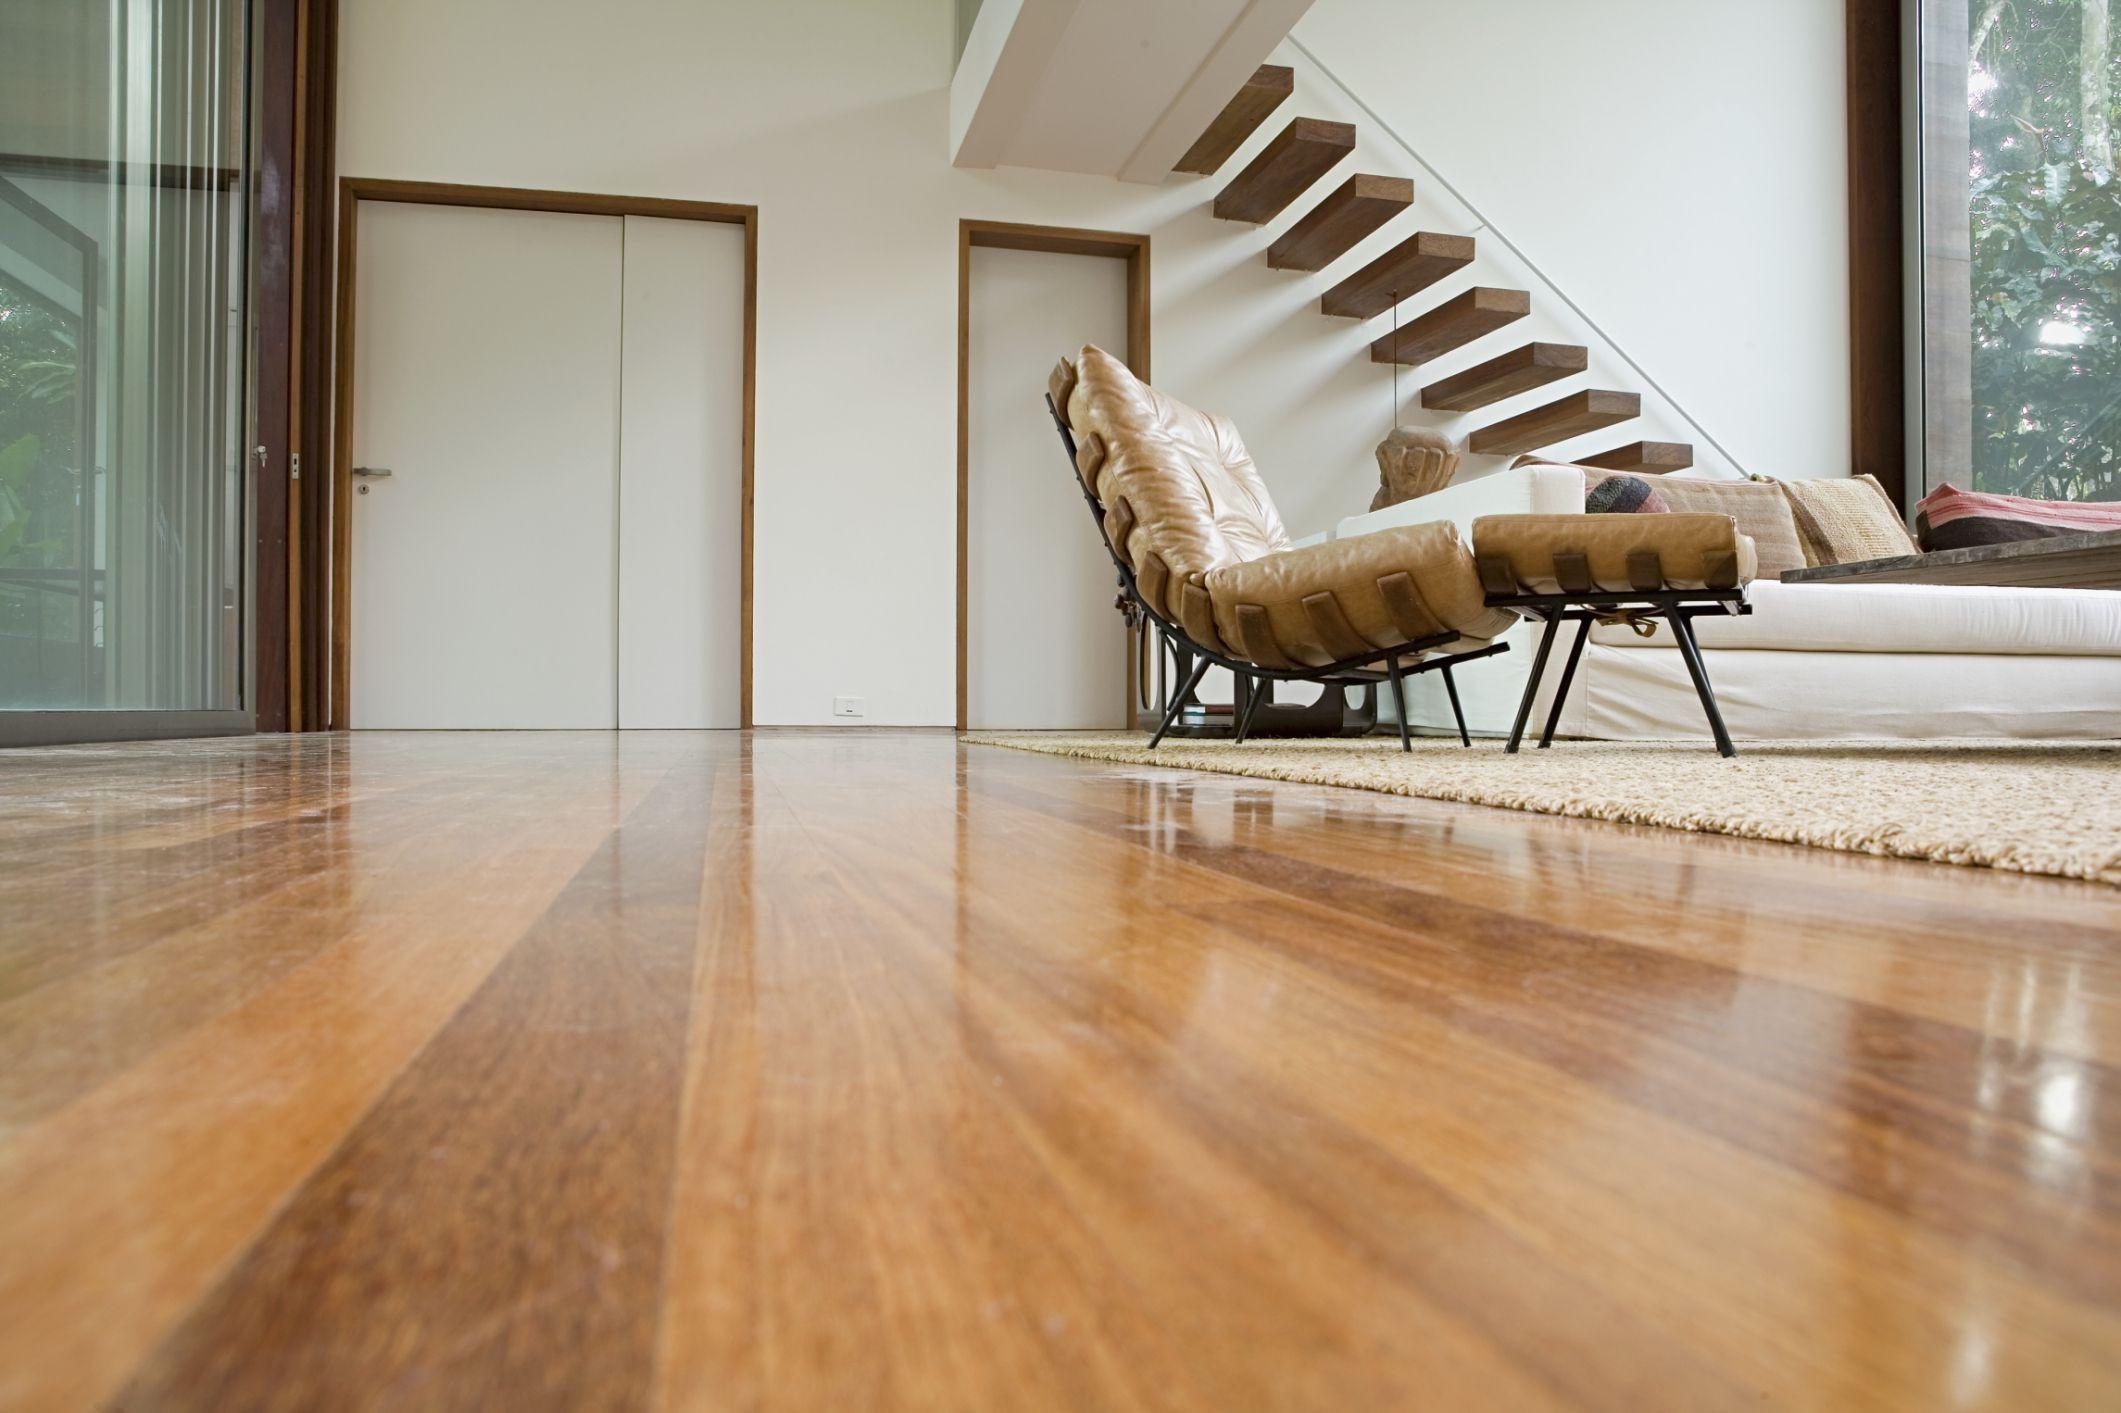 Best Unfinished Hardwood Flooring Of Engineered Wood Flooring Vs solid Wood Flooring In 200571260 001 Highres 56a49dec5f9b58b7d0d7dc1e